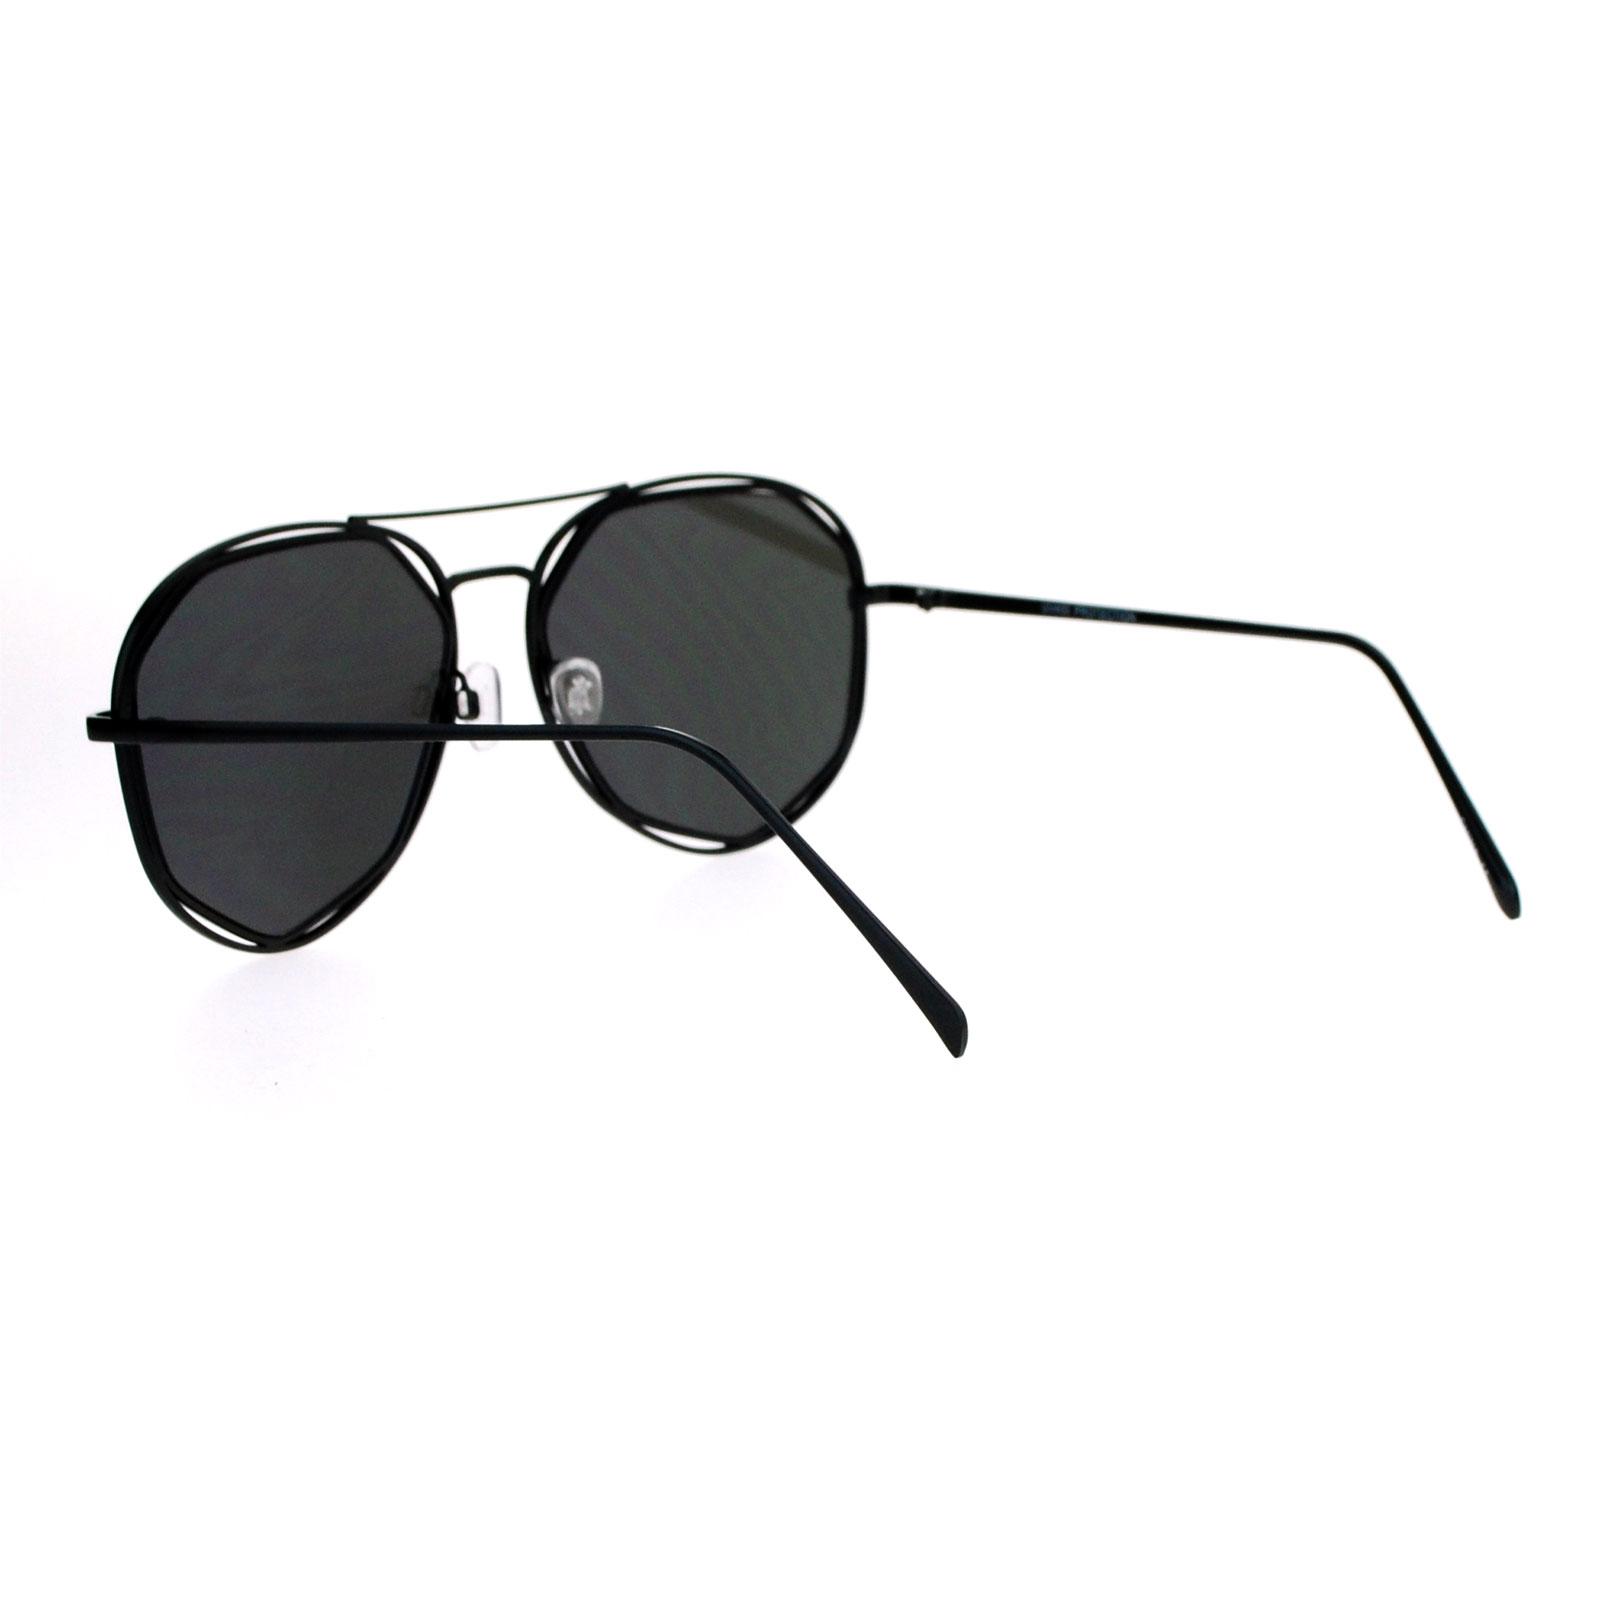 a1a8d857ce09 SA106 Octagon Double Frame Aviator Mirror Lens Womens Sunglasses | eBay